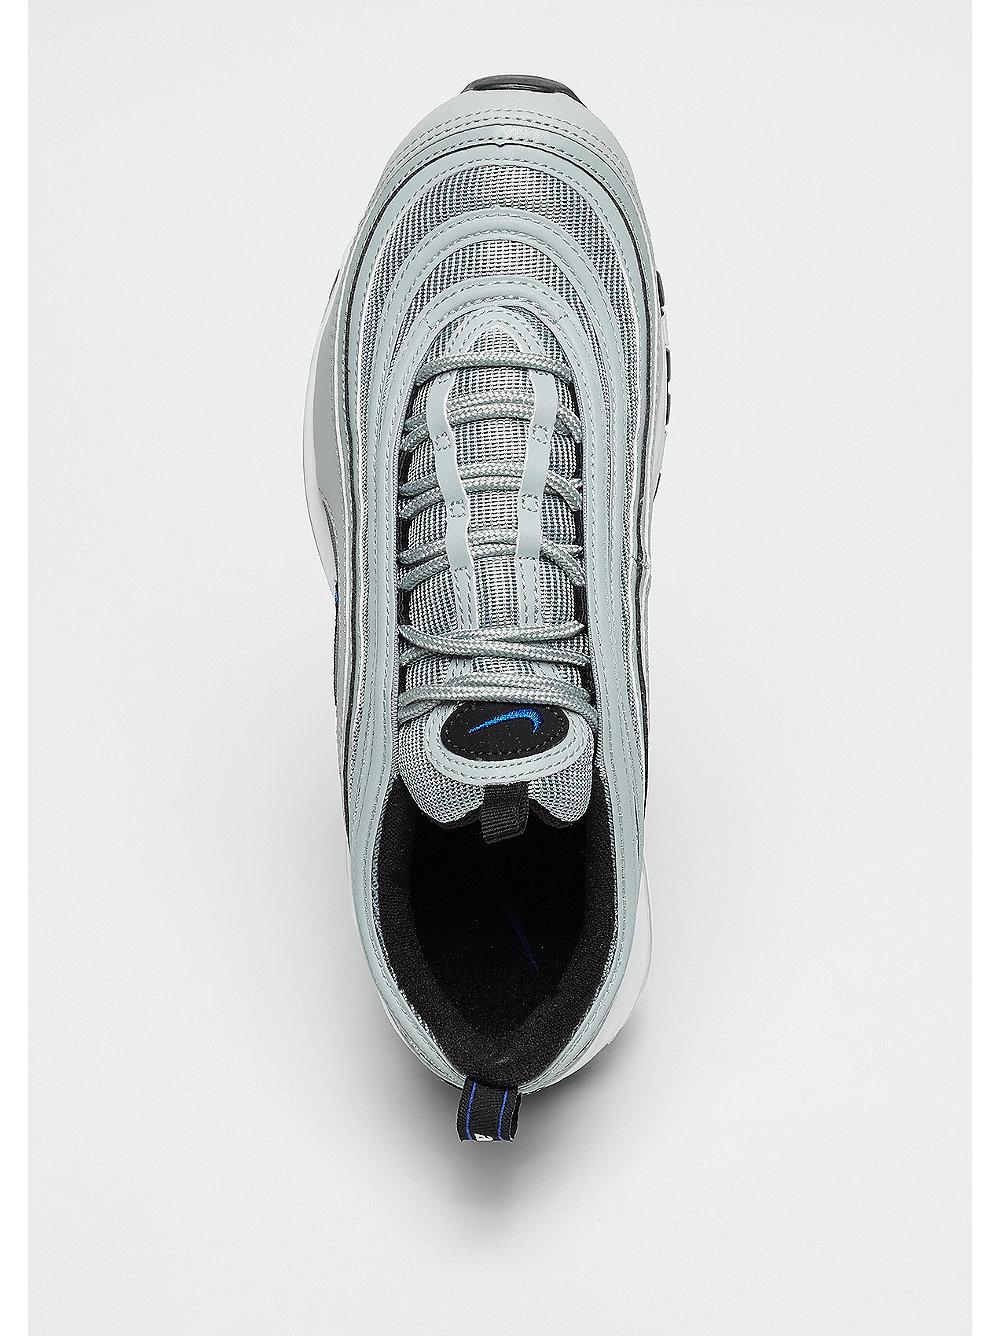 Neu Nike Air Max 97 Damen Snipes gallery zalaces billig